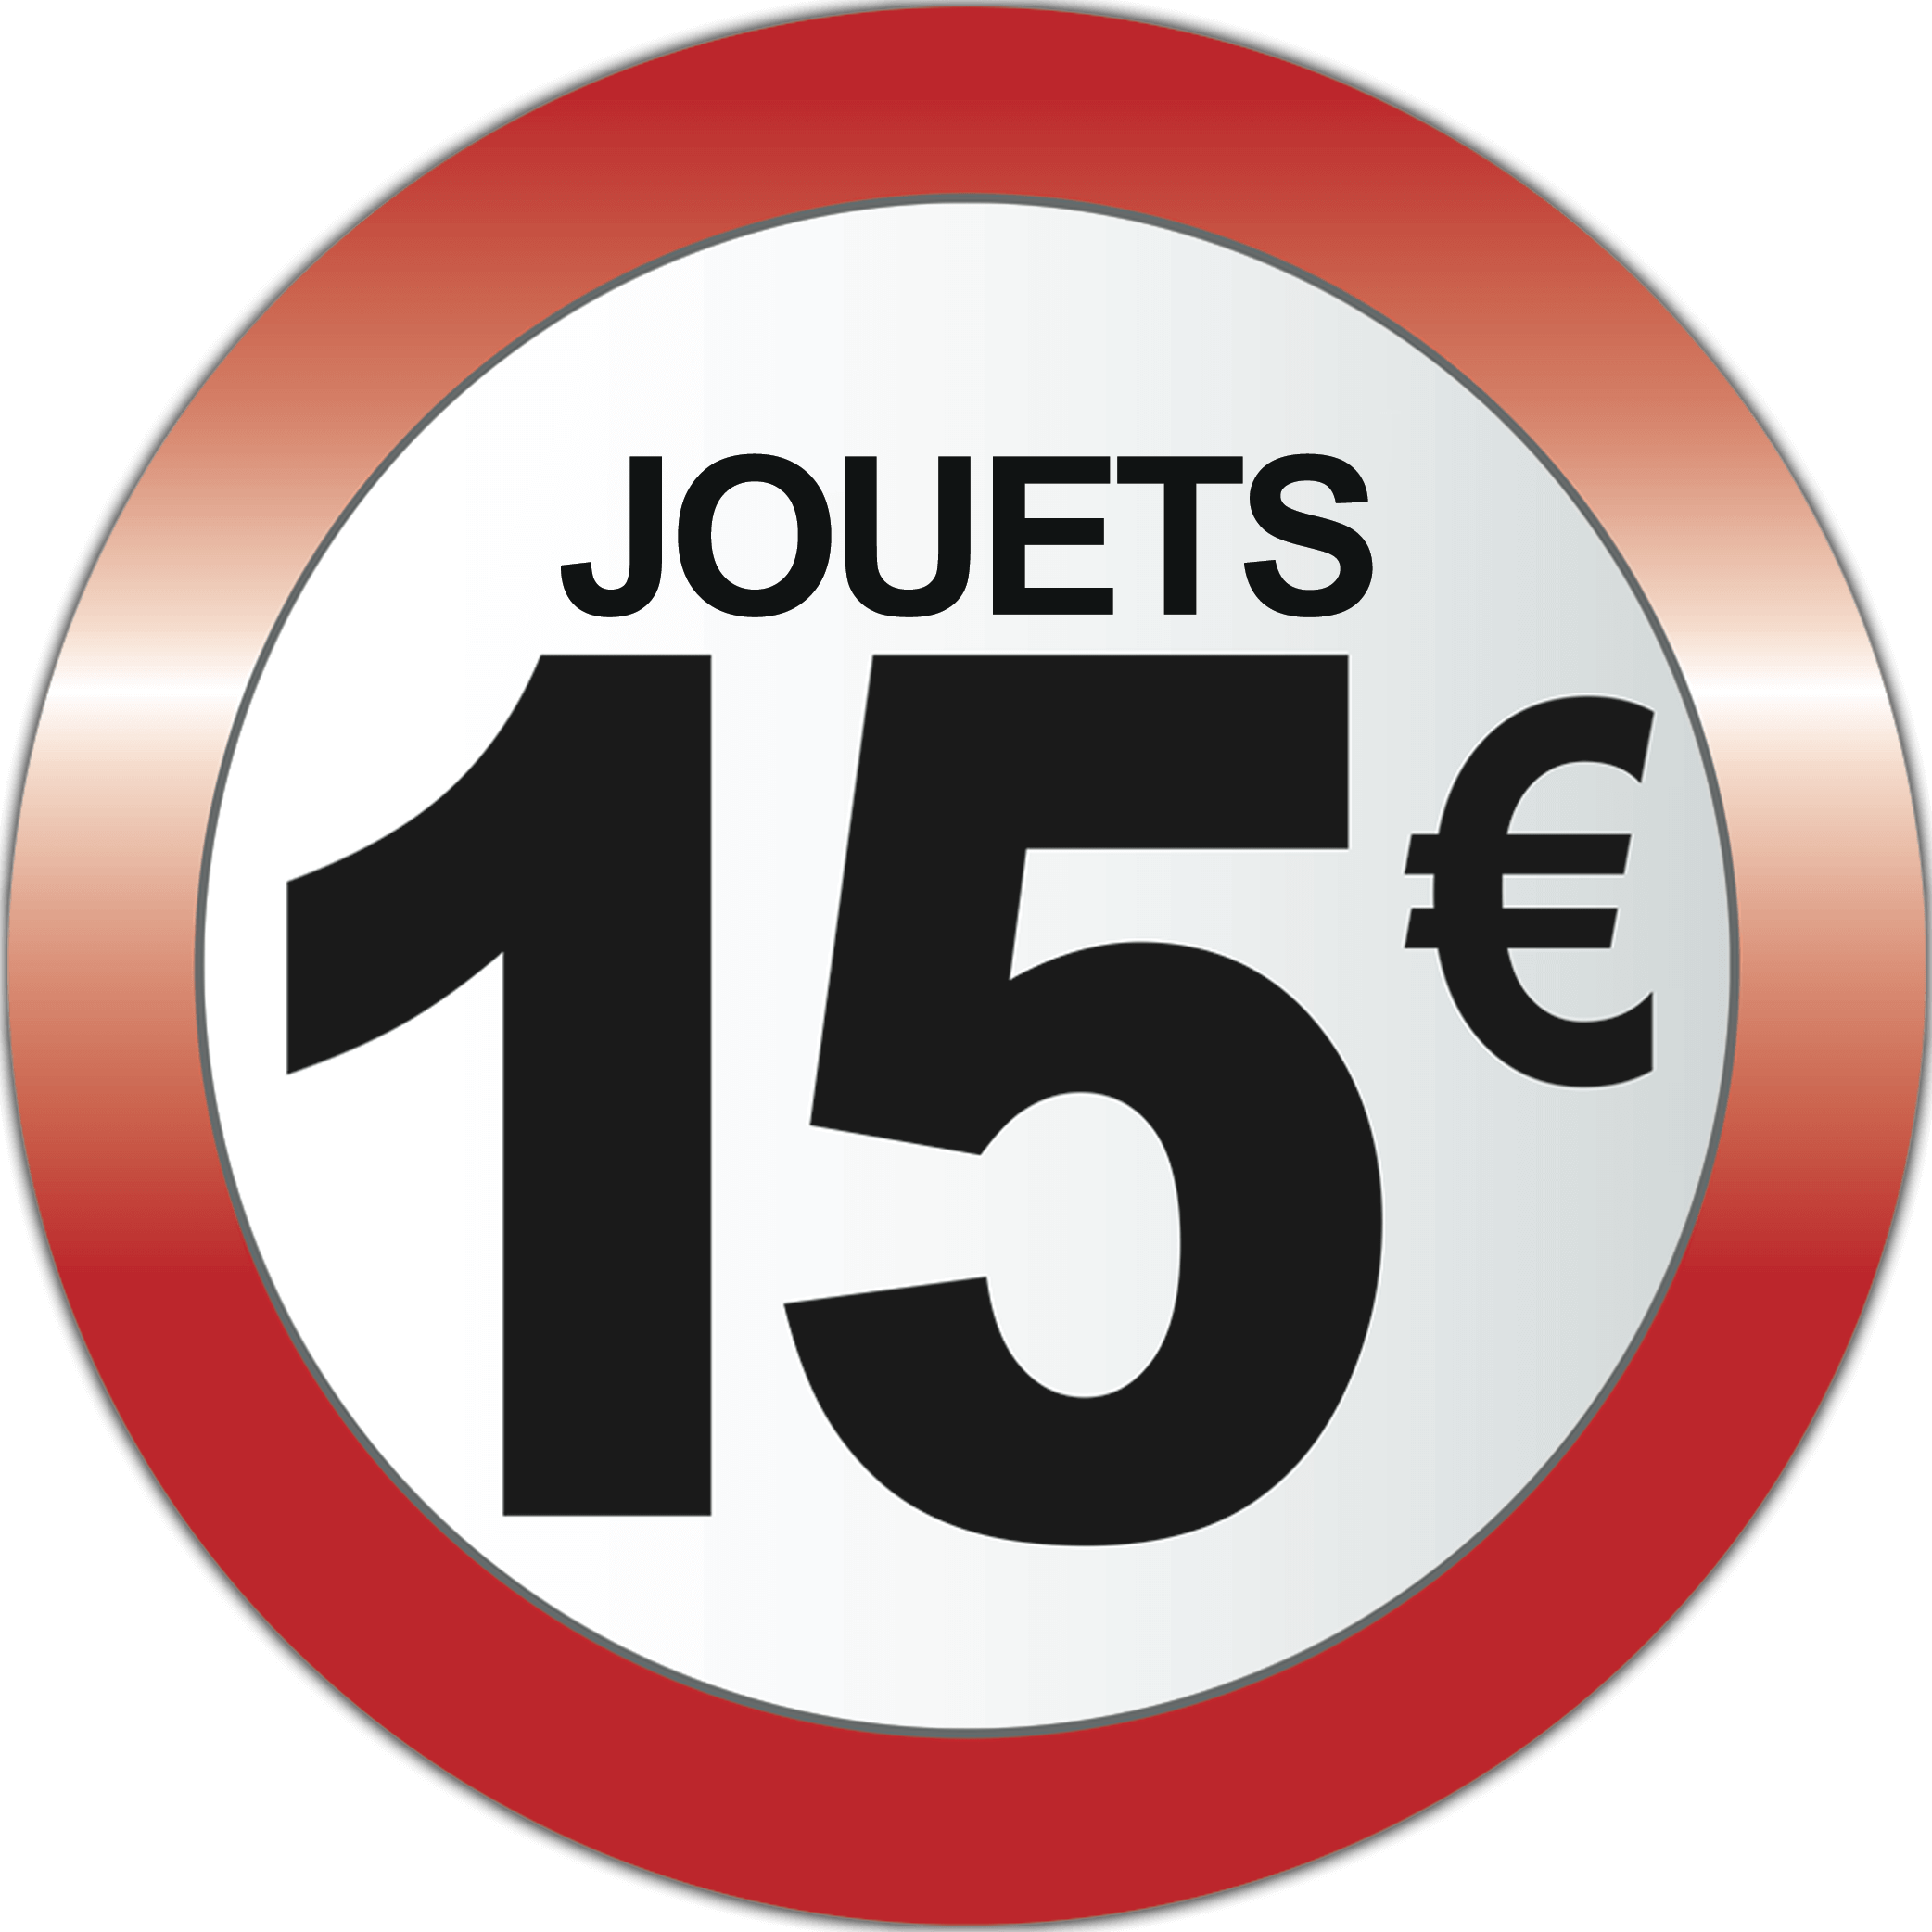 Jouets 15€